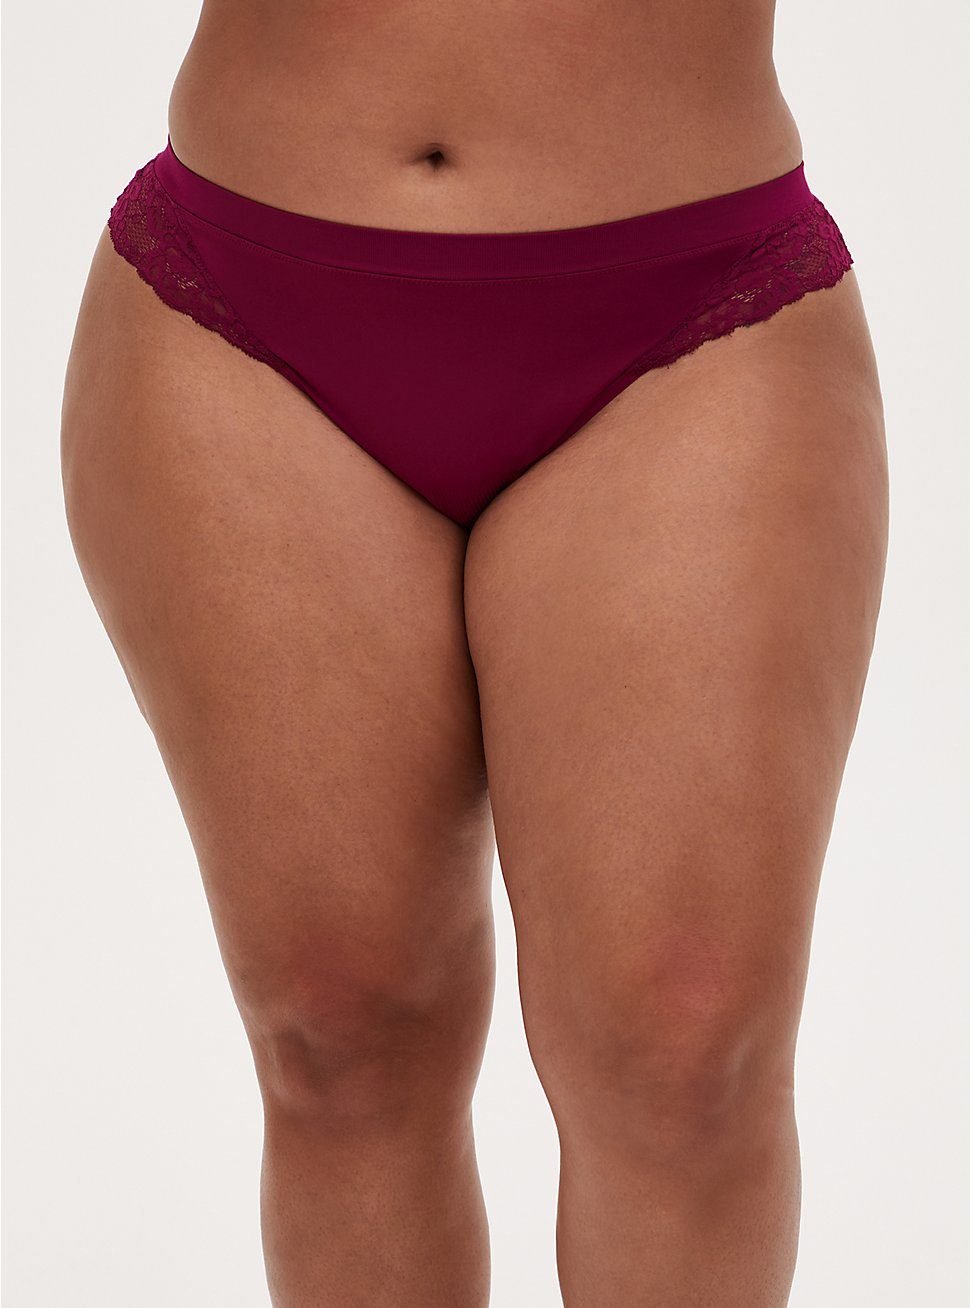 Berry Pink Lace Inset Seamless Thong Panty , NAVARRA, hi-res